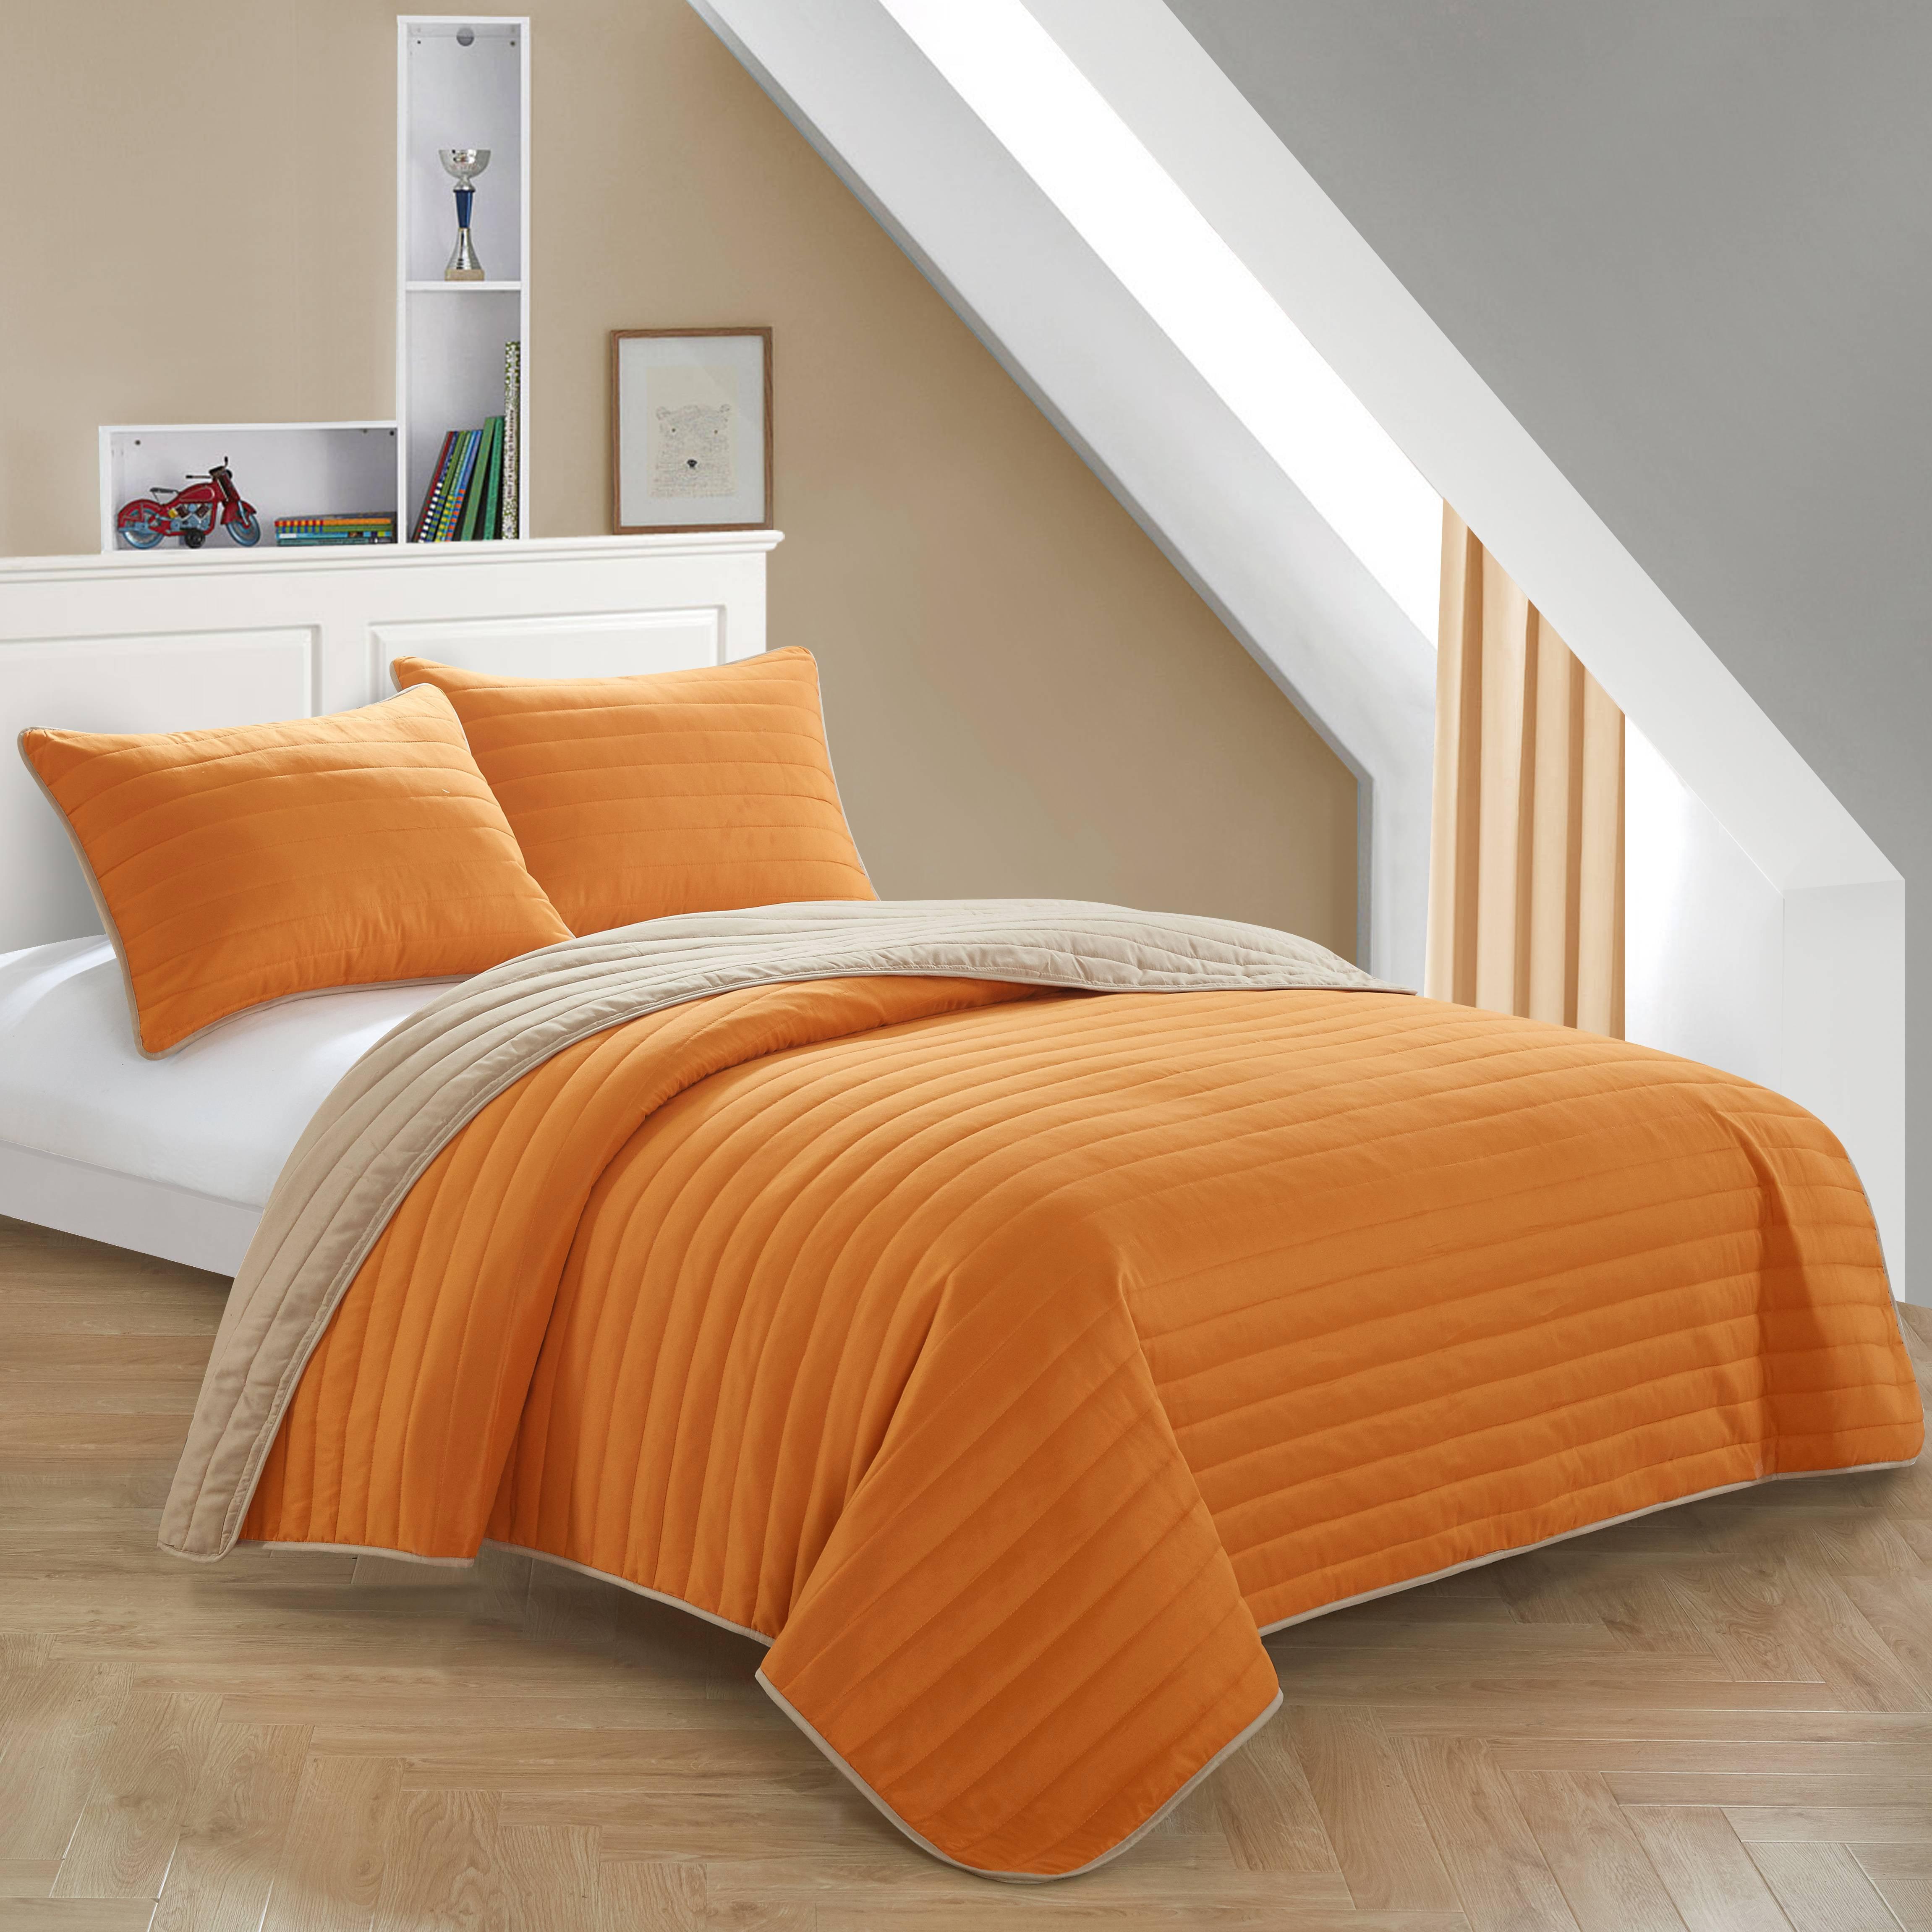 Mainstays Kids Orange Reverse To Tan Quilt Set by Idea Nuova